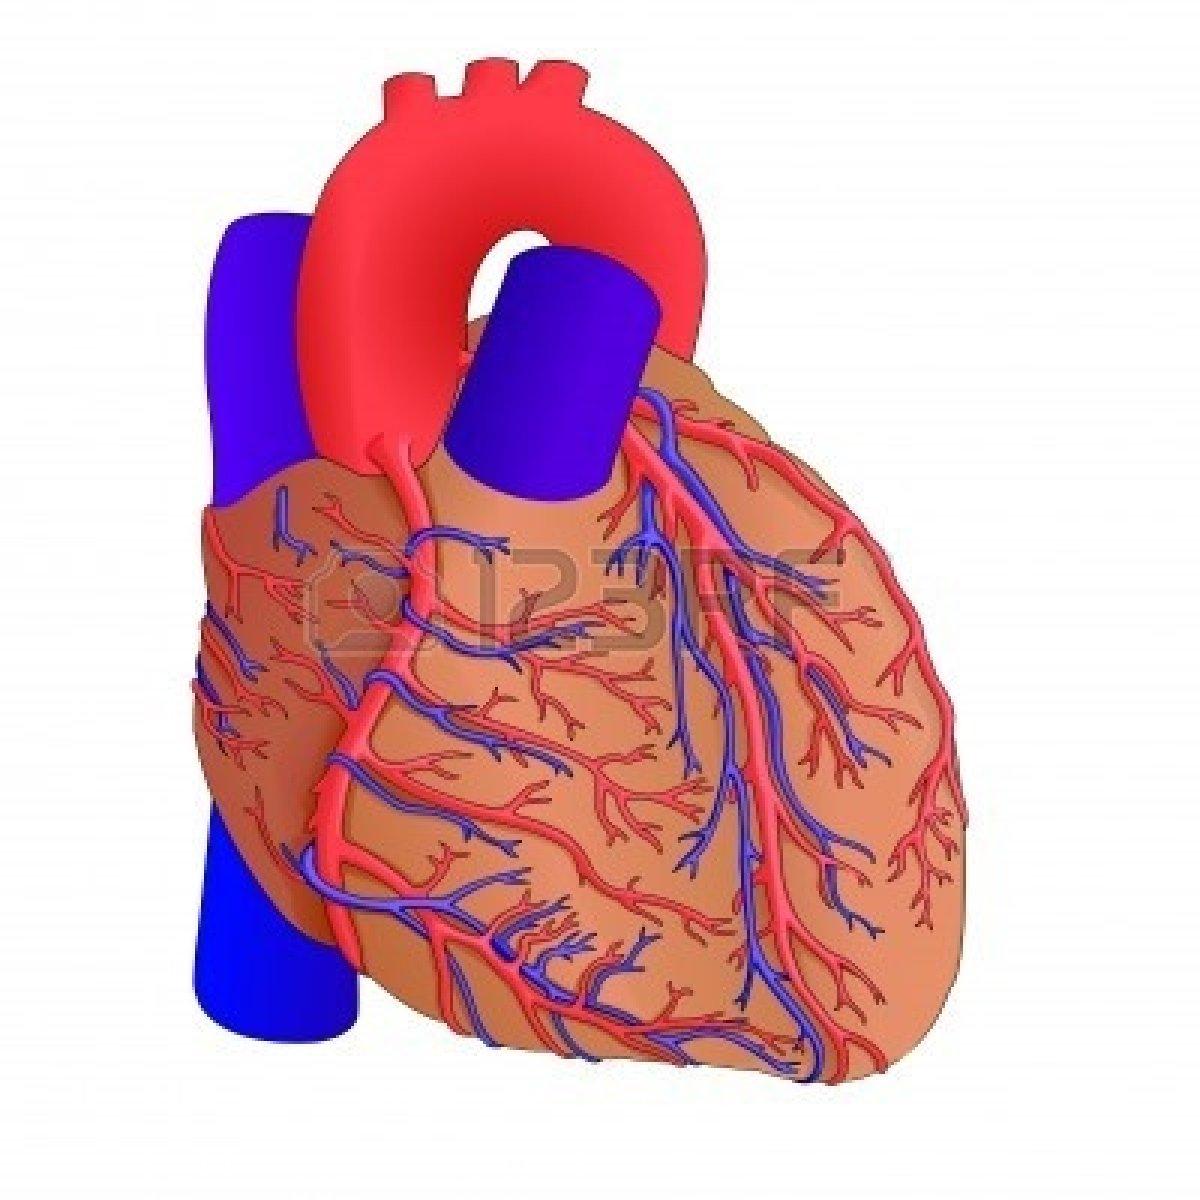 Animated Human Heart Clipart Human Heart Anatomy Cliparts.